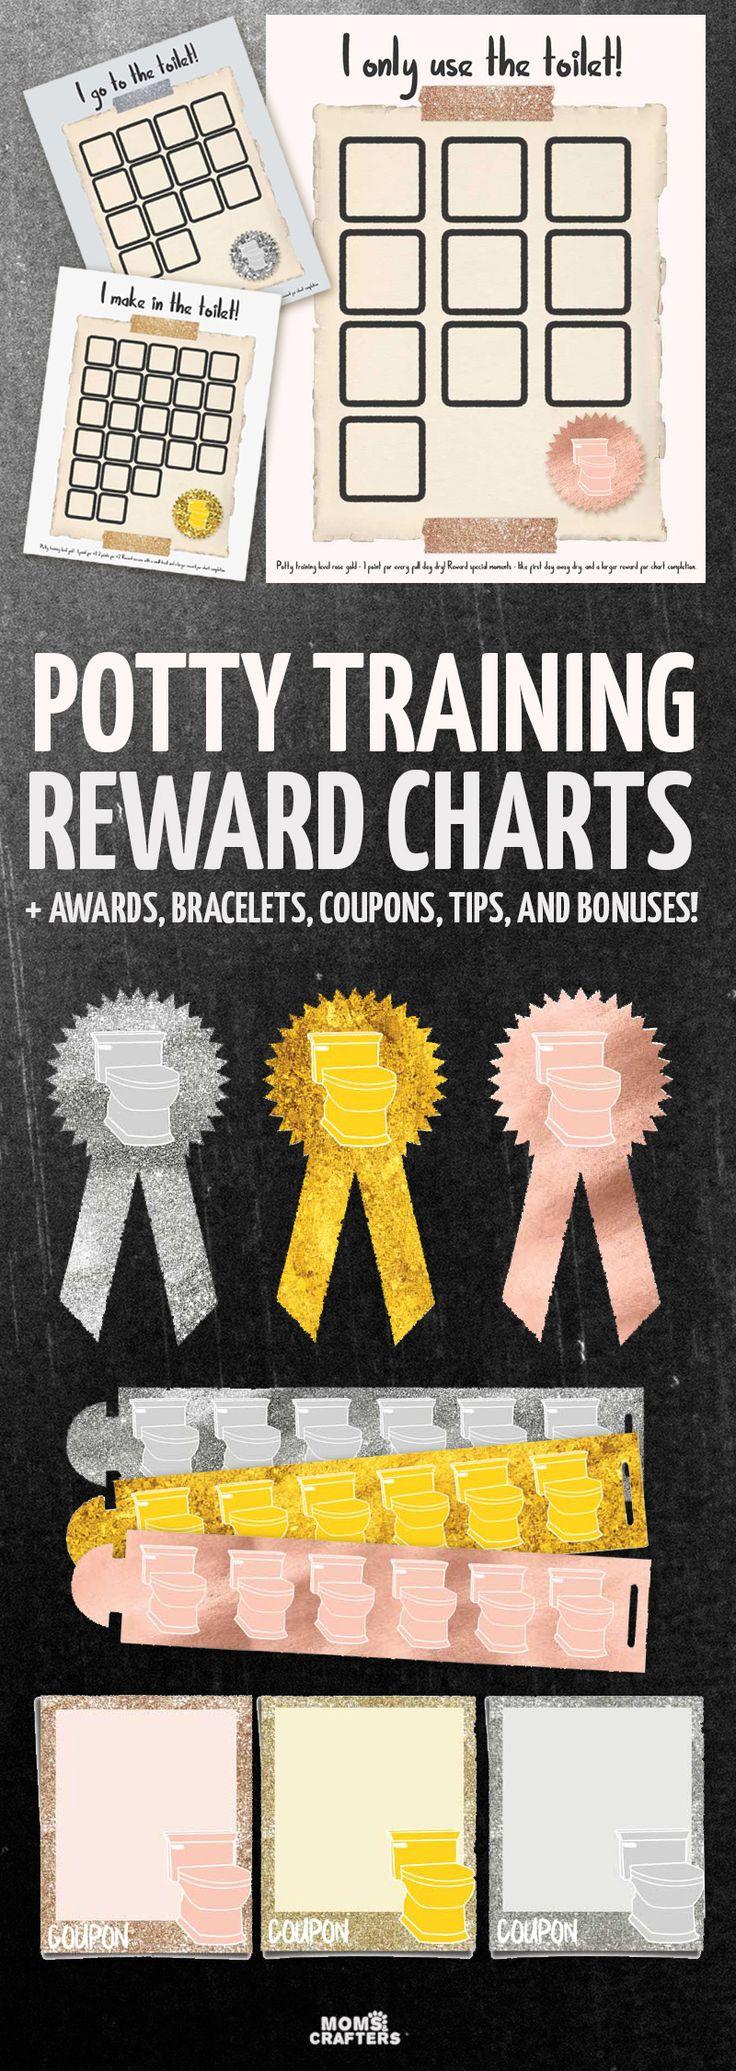 bedste id eacute er til printable potty chart p aring  grab these potty training reward charts